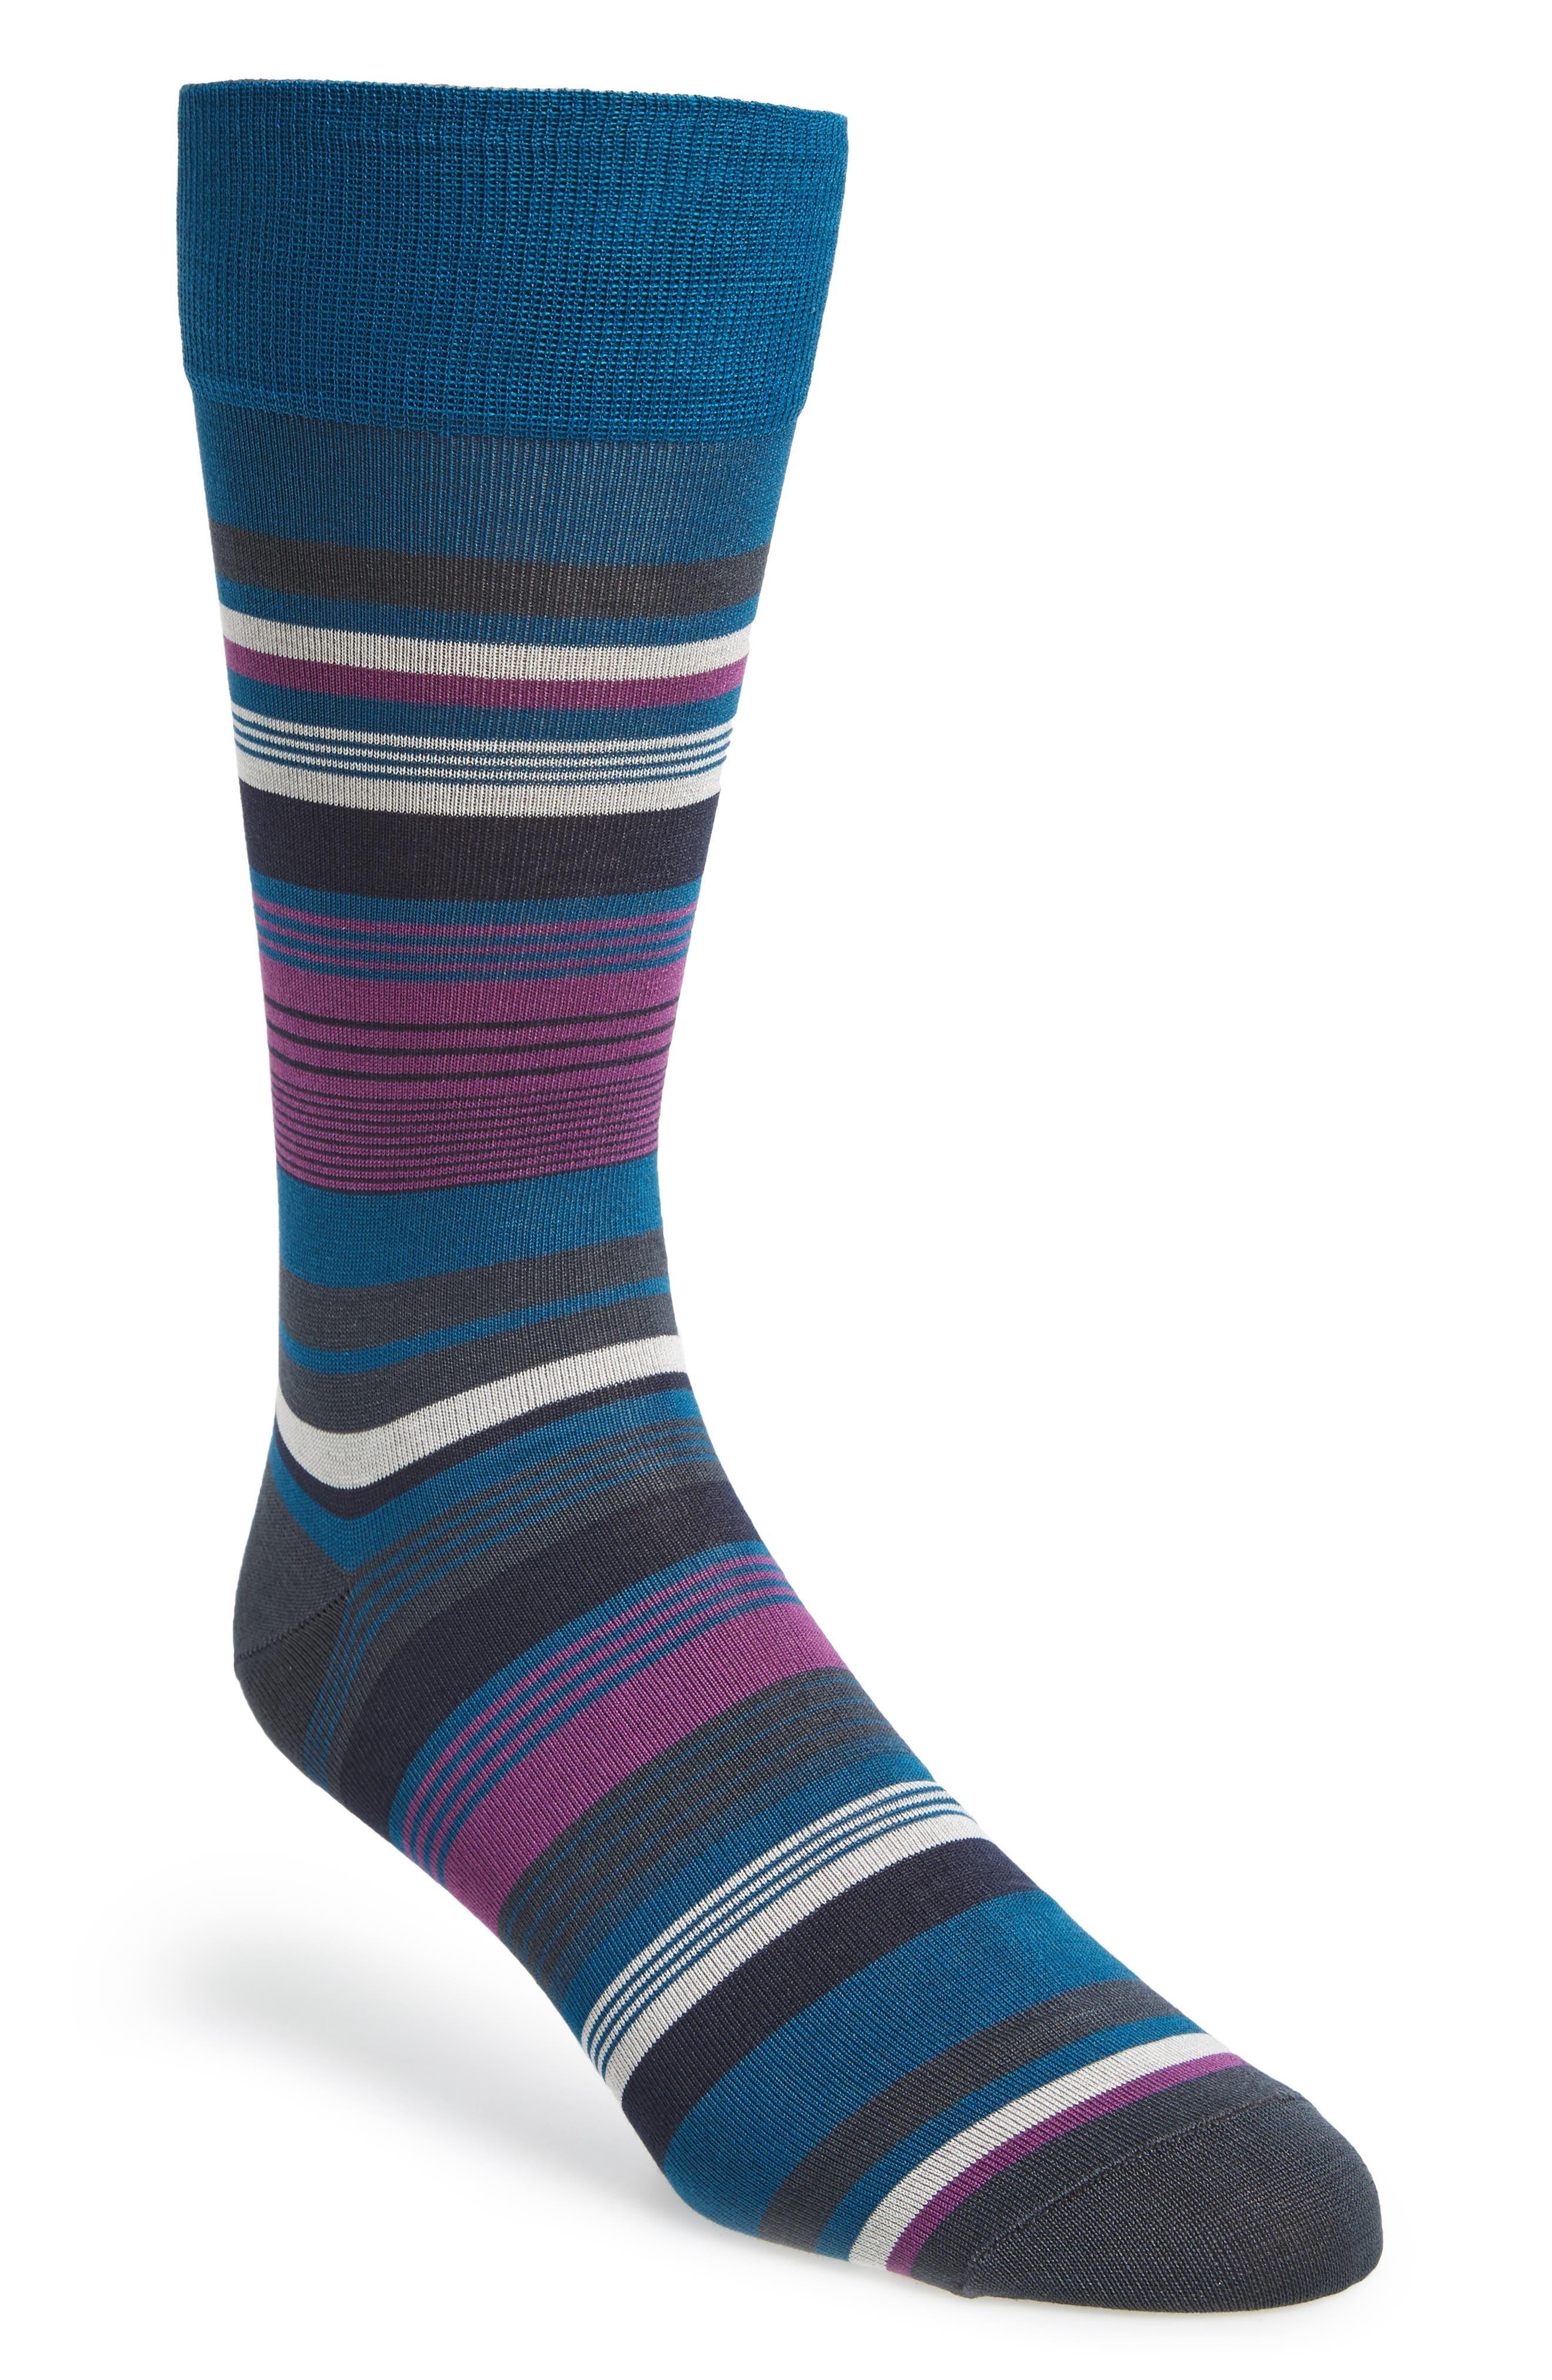 Stripe Socks,                         Main,                         color, Teal Mosaic